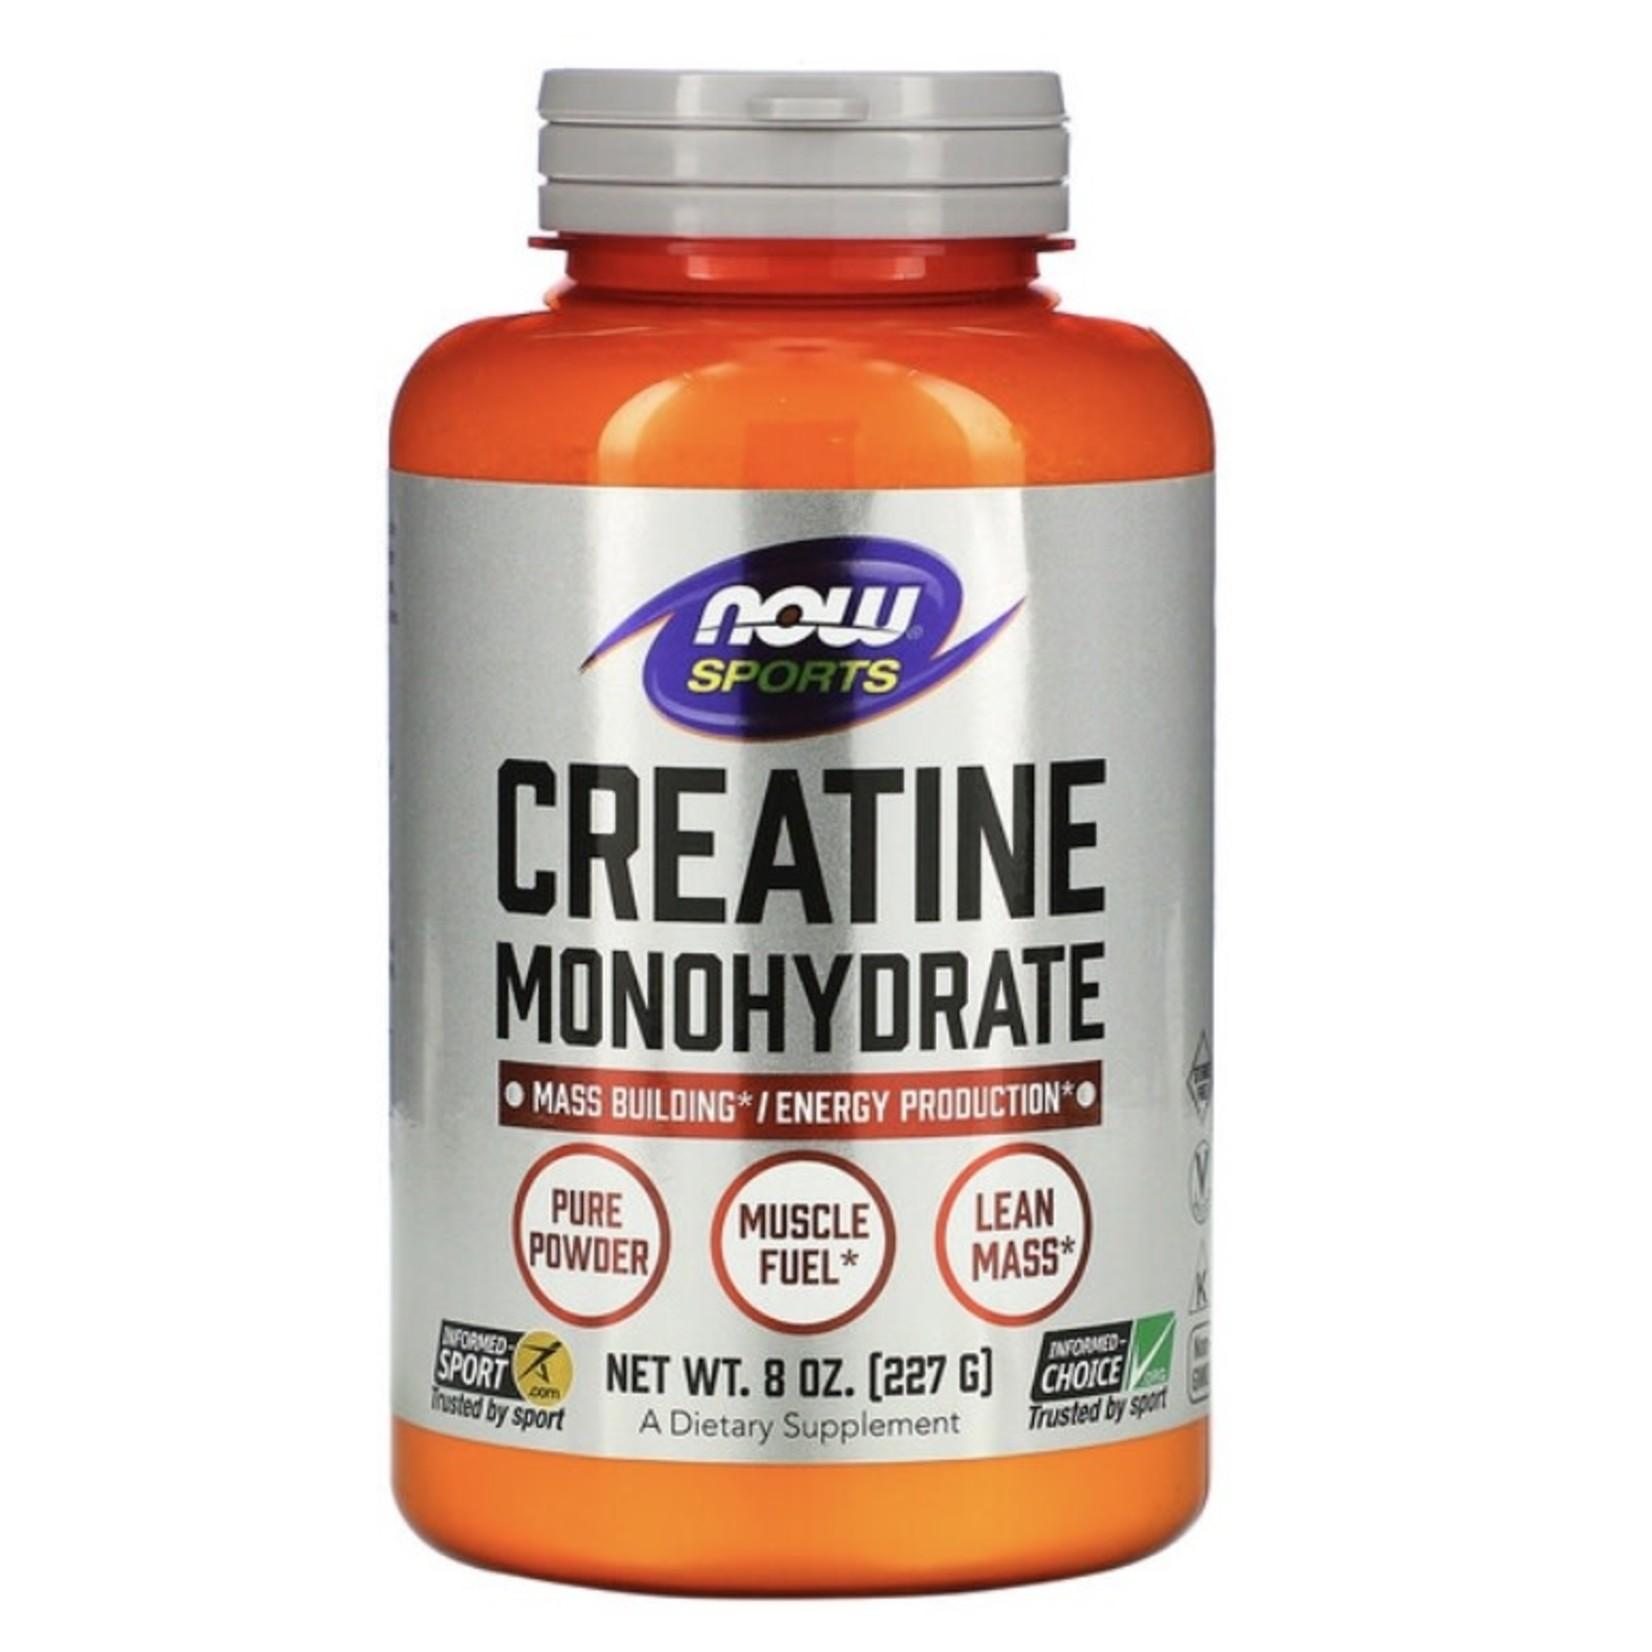 Now Now Creatine Monohydrate 227g